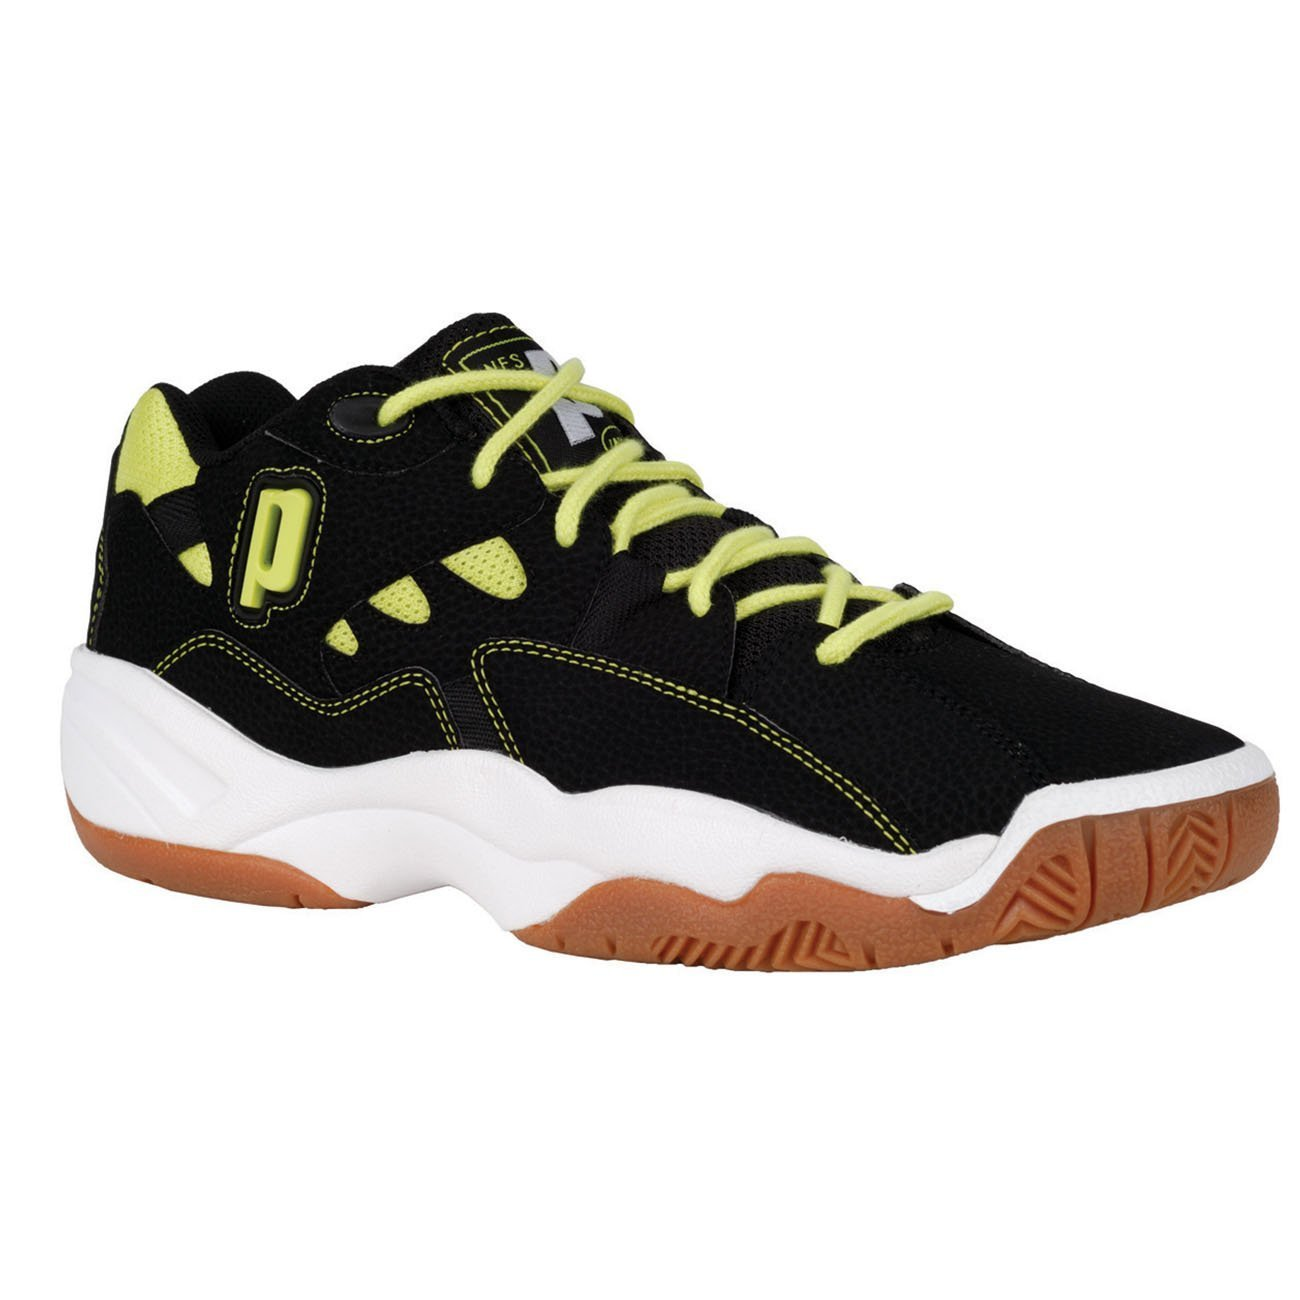 Prince NFS Squash Indoor Shoe Size 6 UK